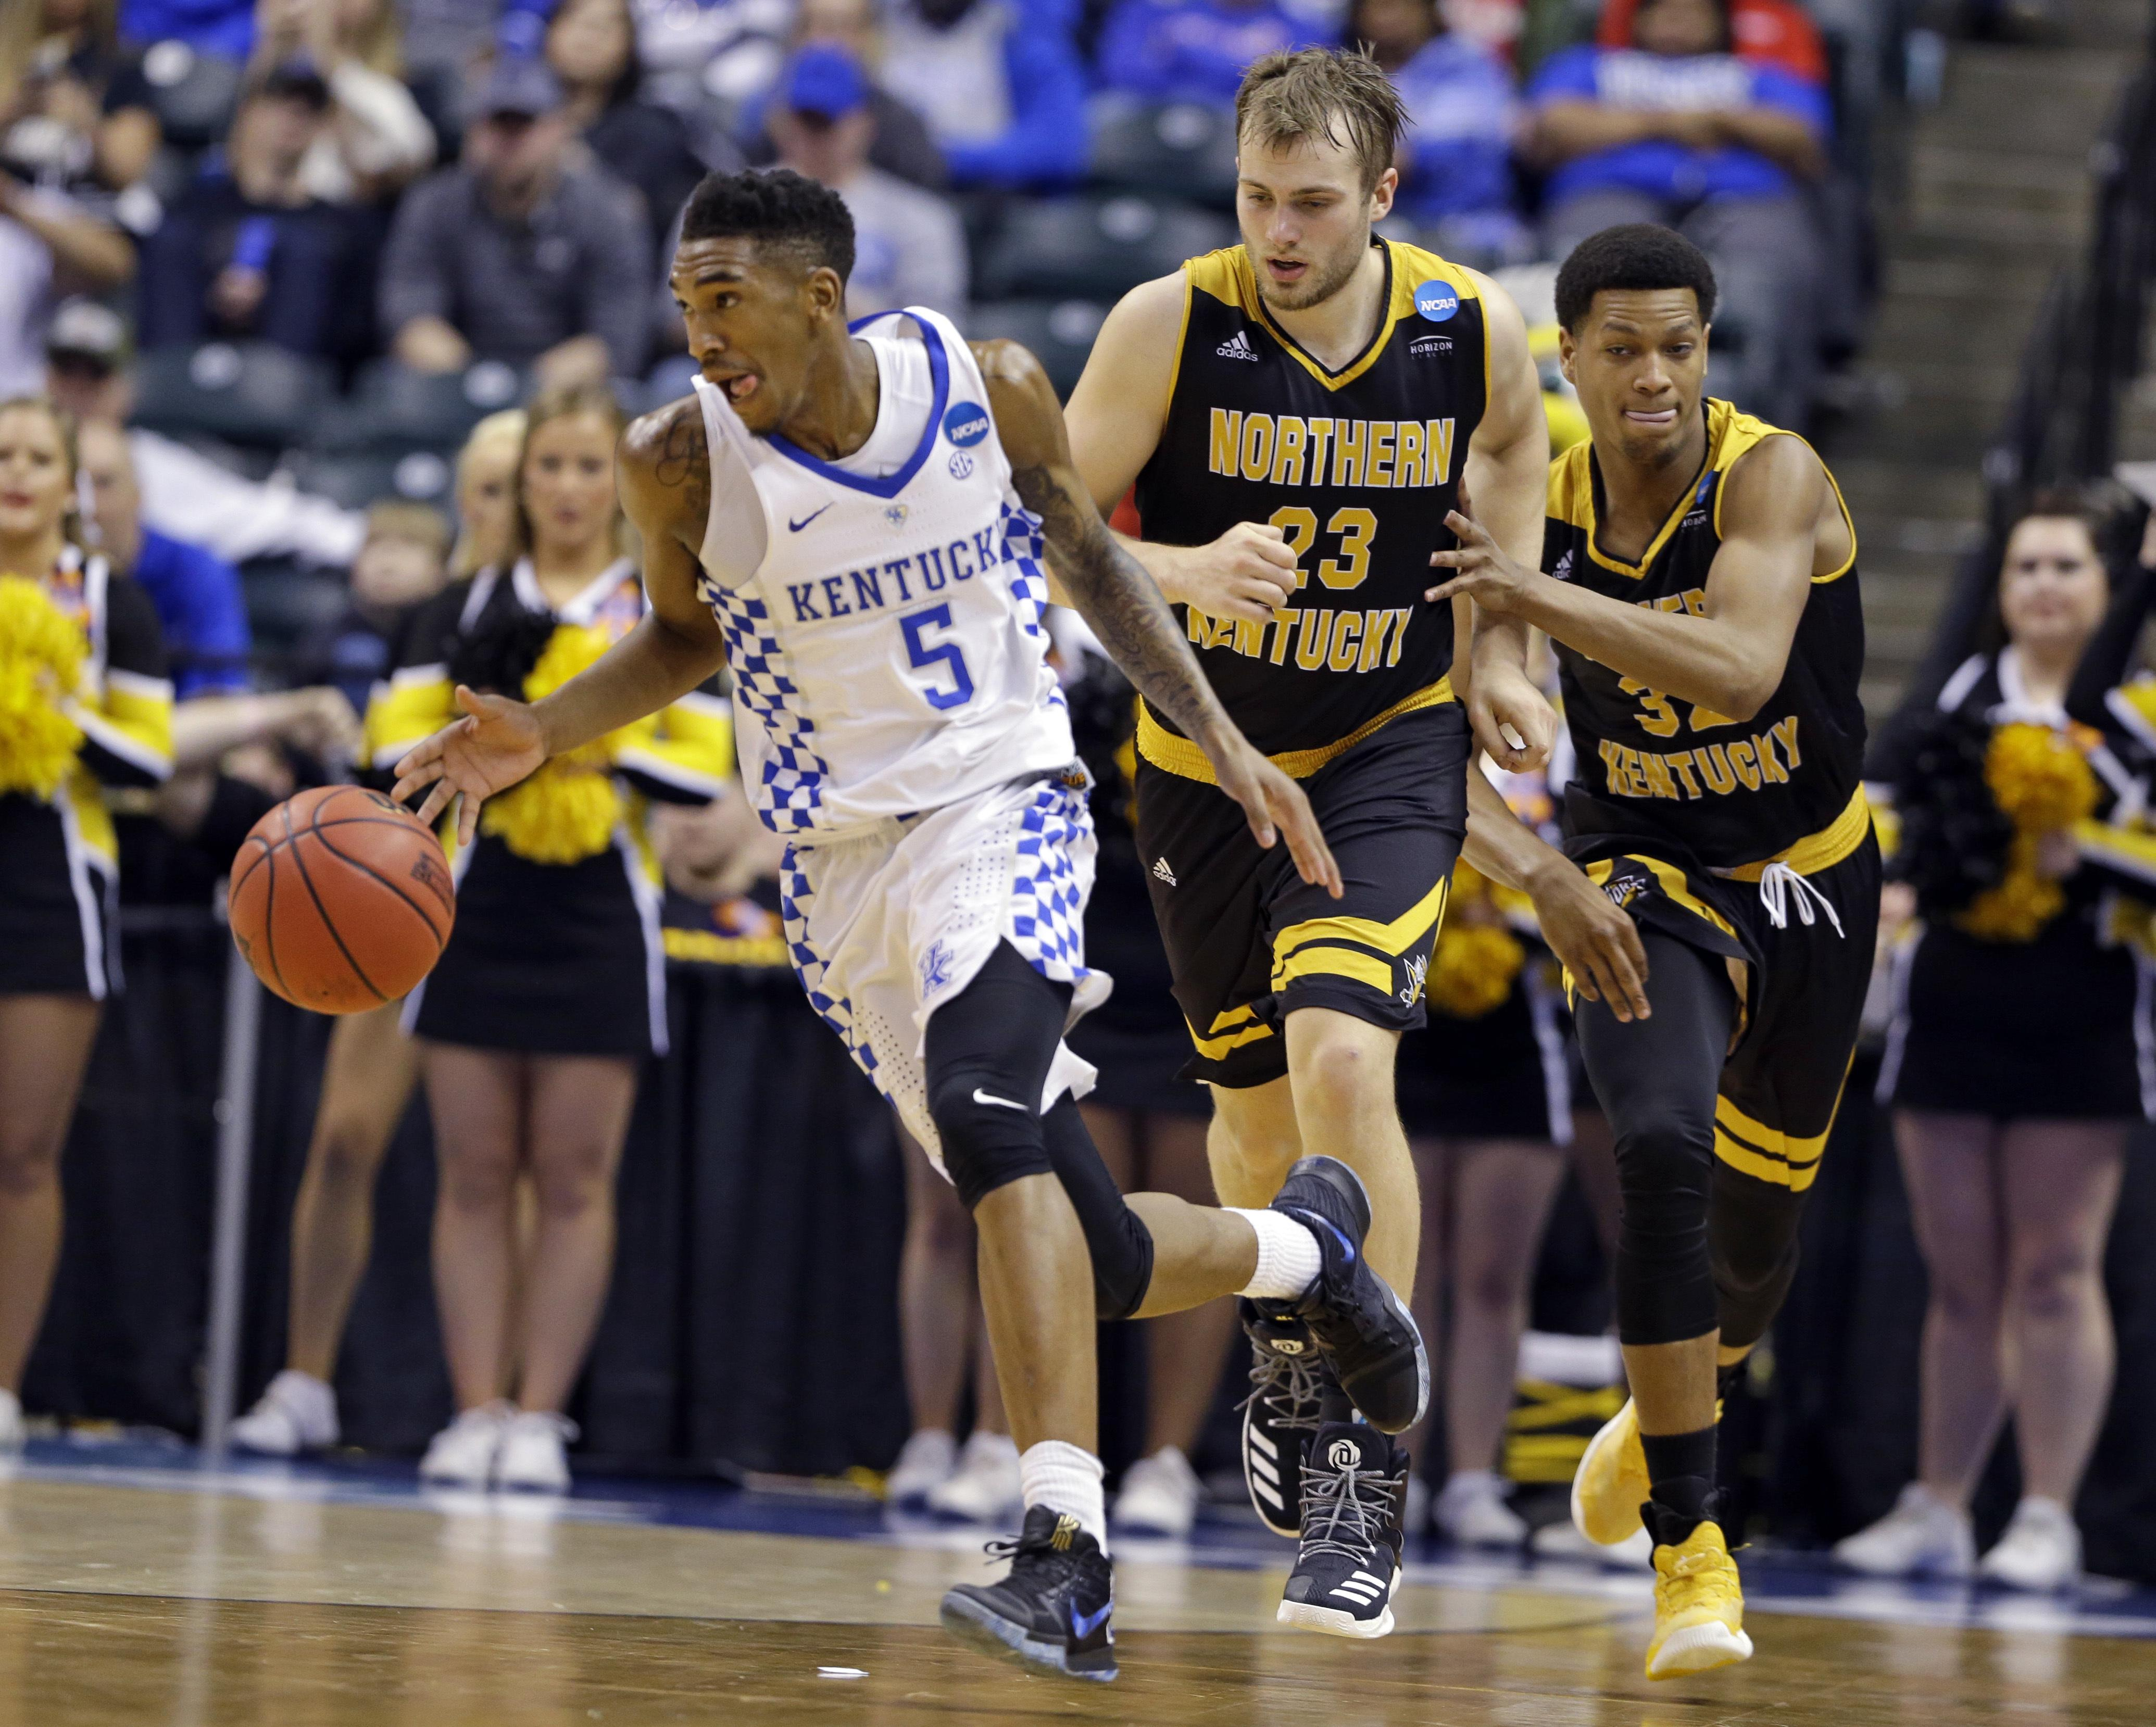 60f99ffefdb Kentucky guard Malik Monk (5) is chased by Northern Kentucky forward Carson  Williams (